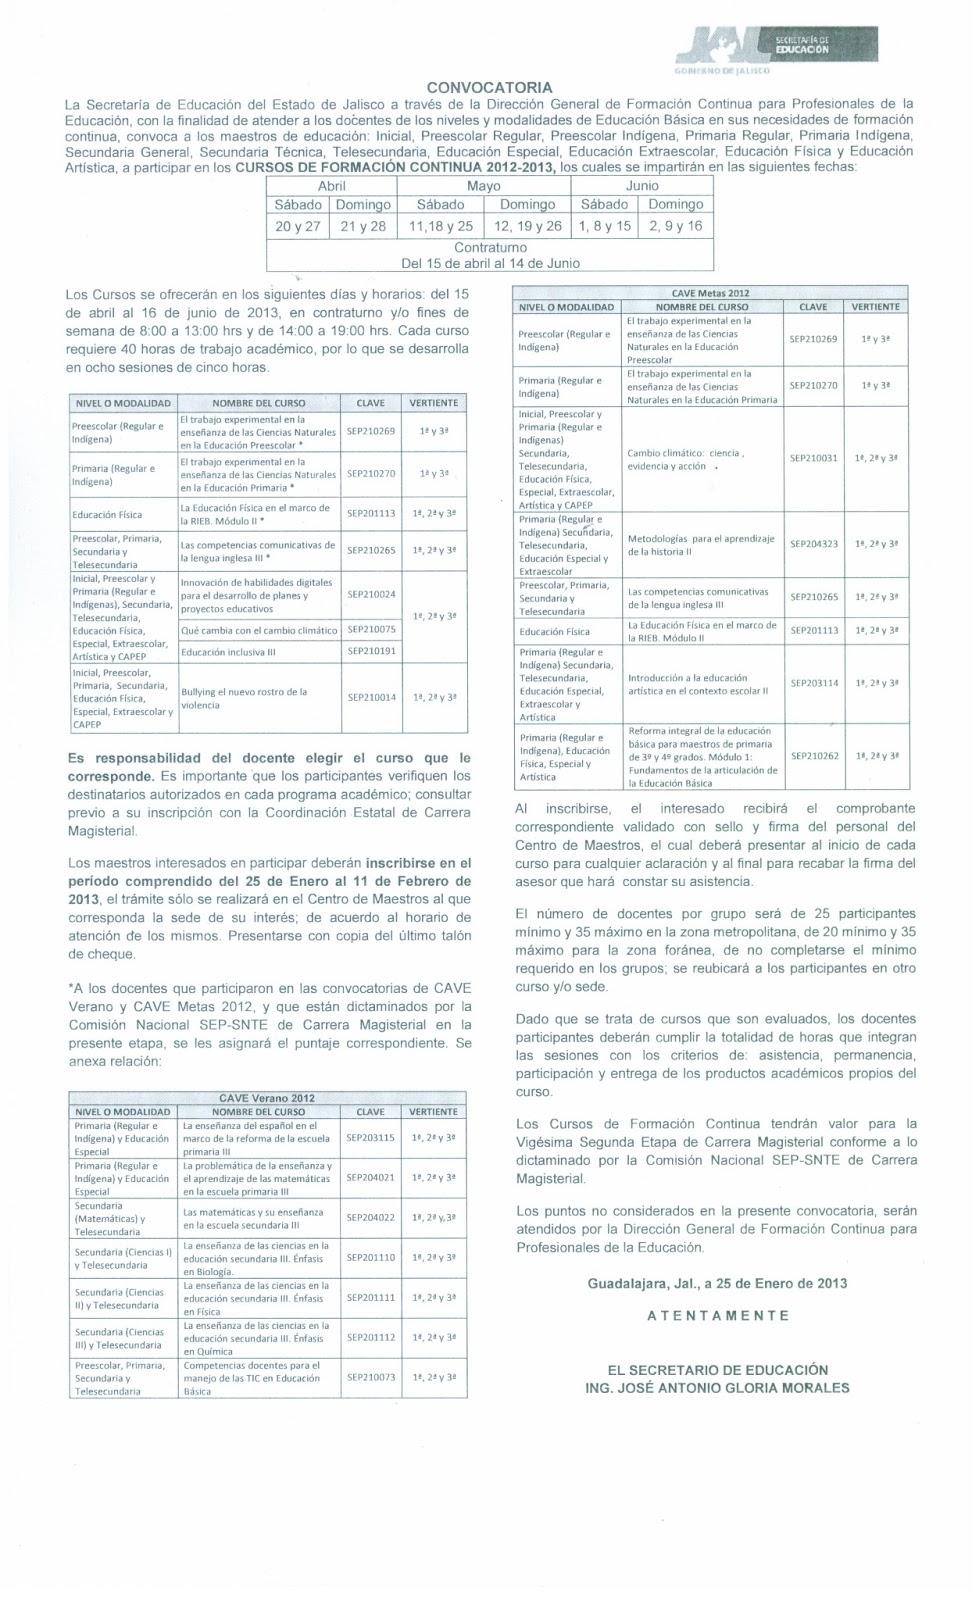 Centro de maestros 1431 cursos de formaci n continua 2012 for Convocatoria de maestros